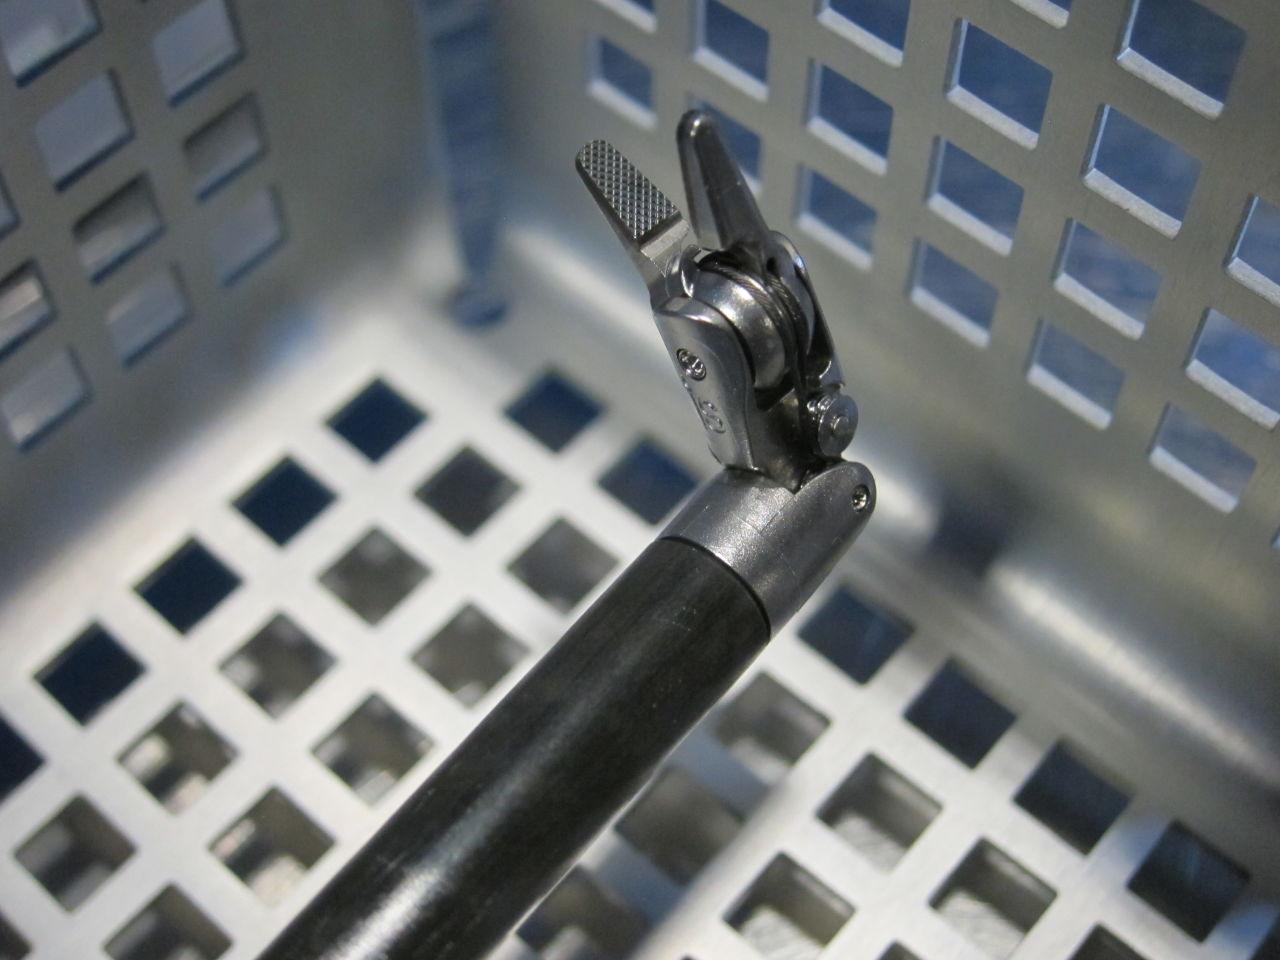 DA VINCI S SURGICAL 420194 Mega Needle Driver